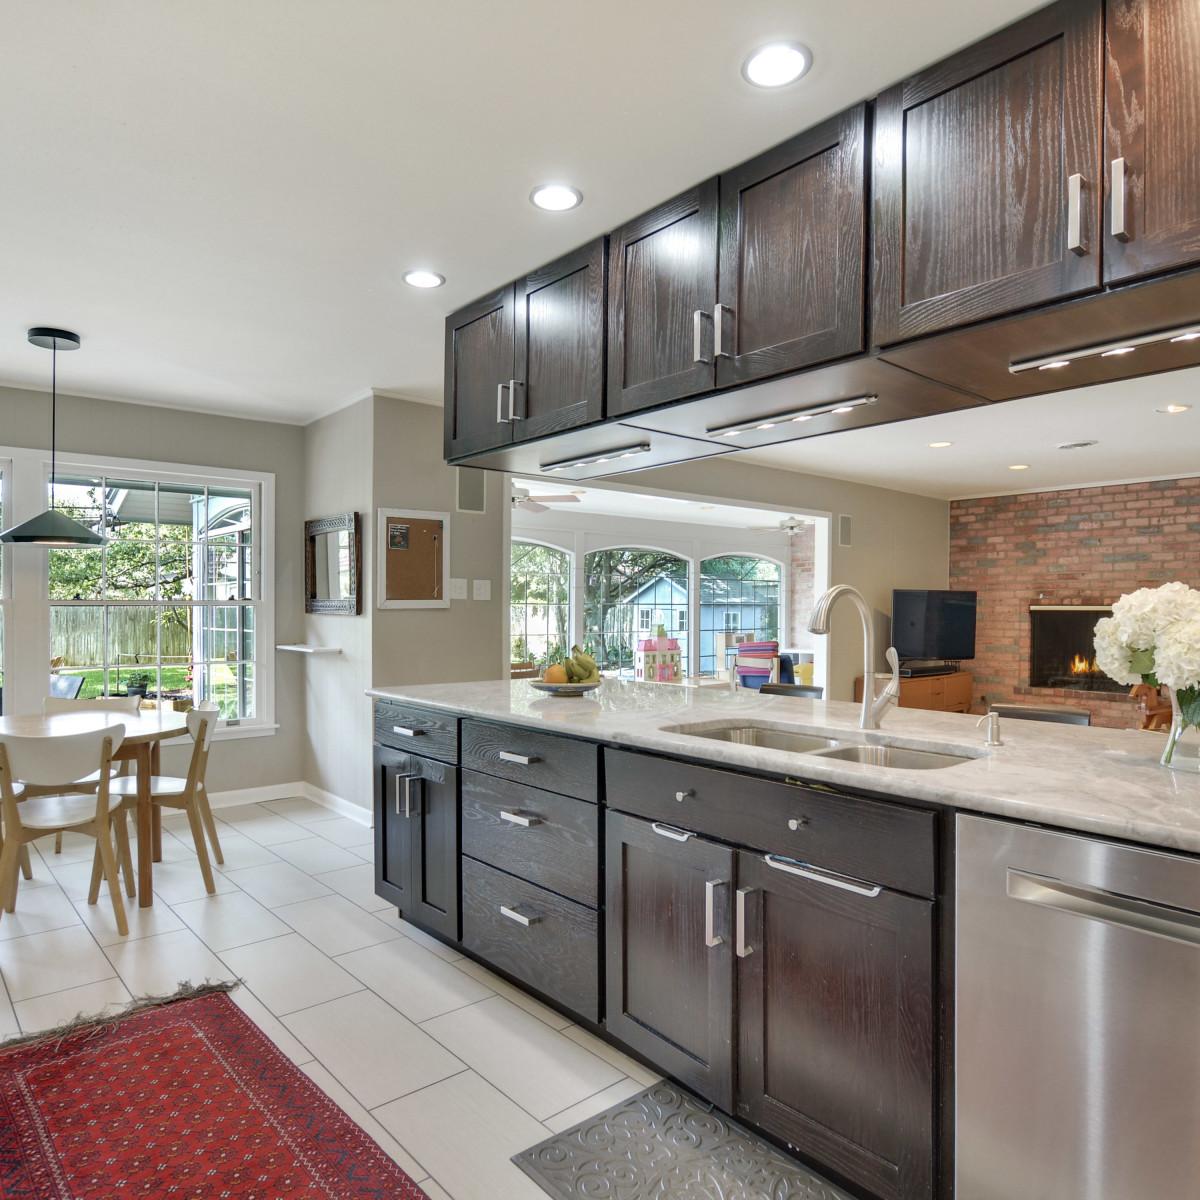 231 Hillview San Antonio house for sale kitchen